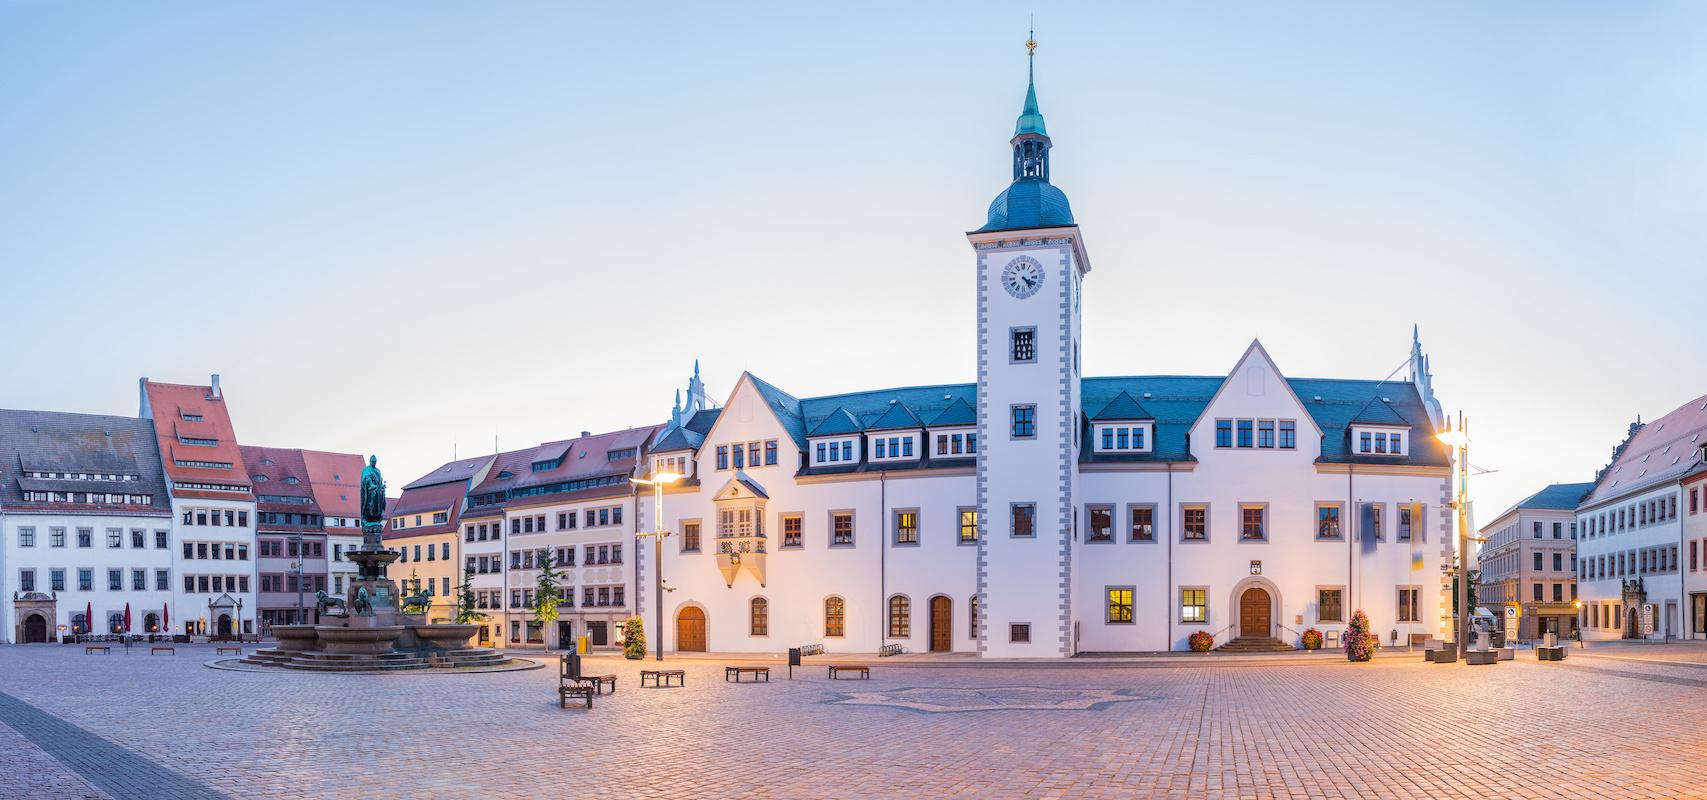 Rathaus Freiberg - Mulderadweg